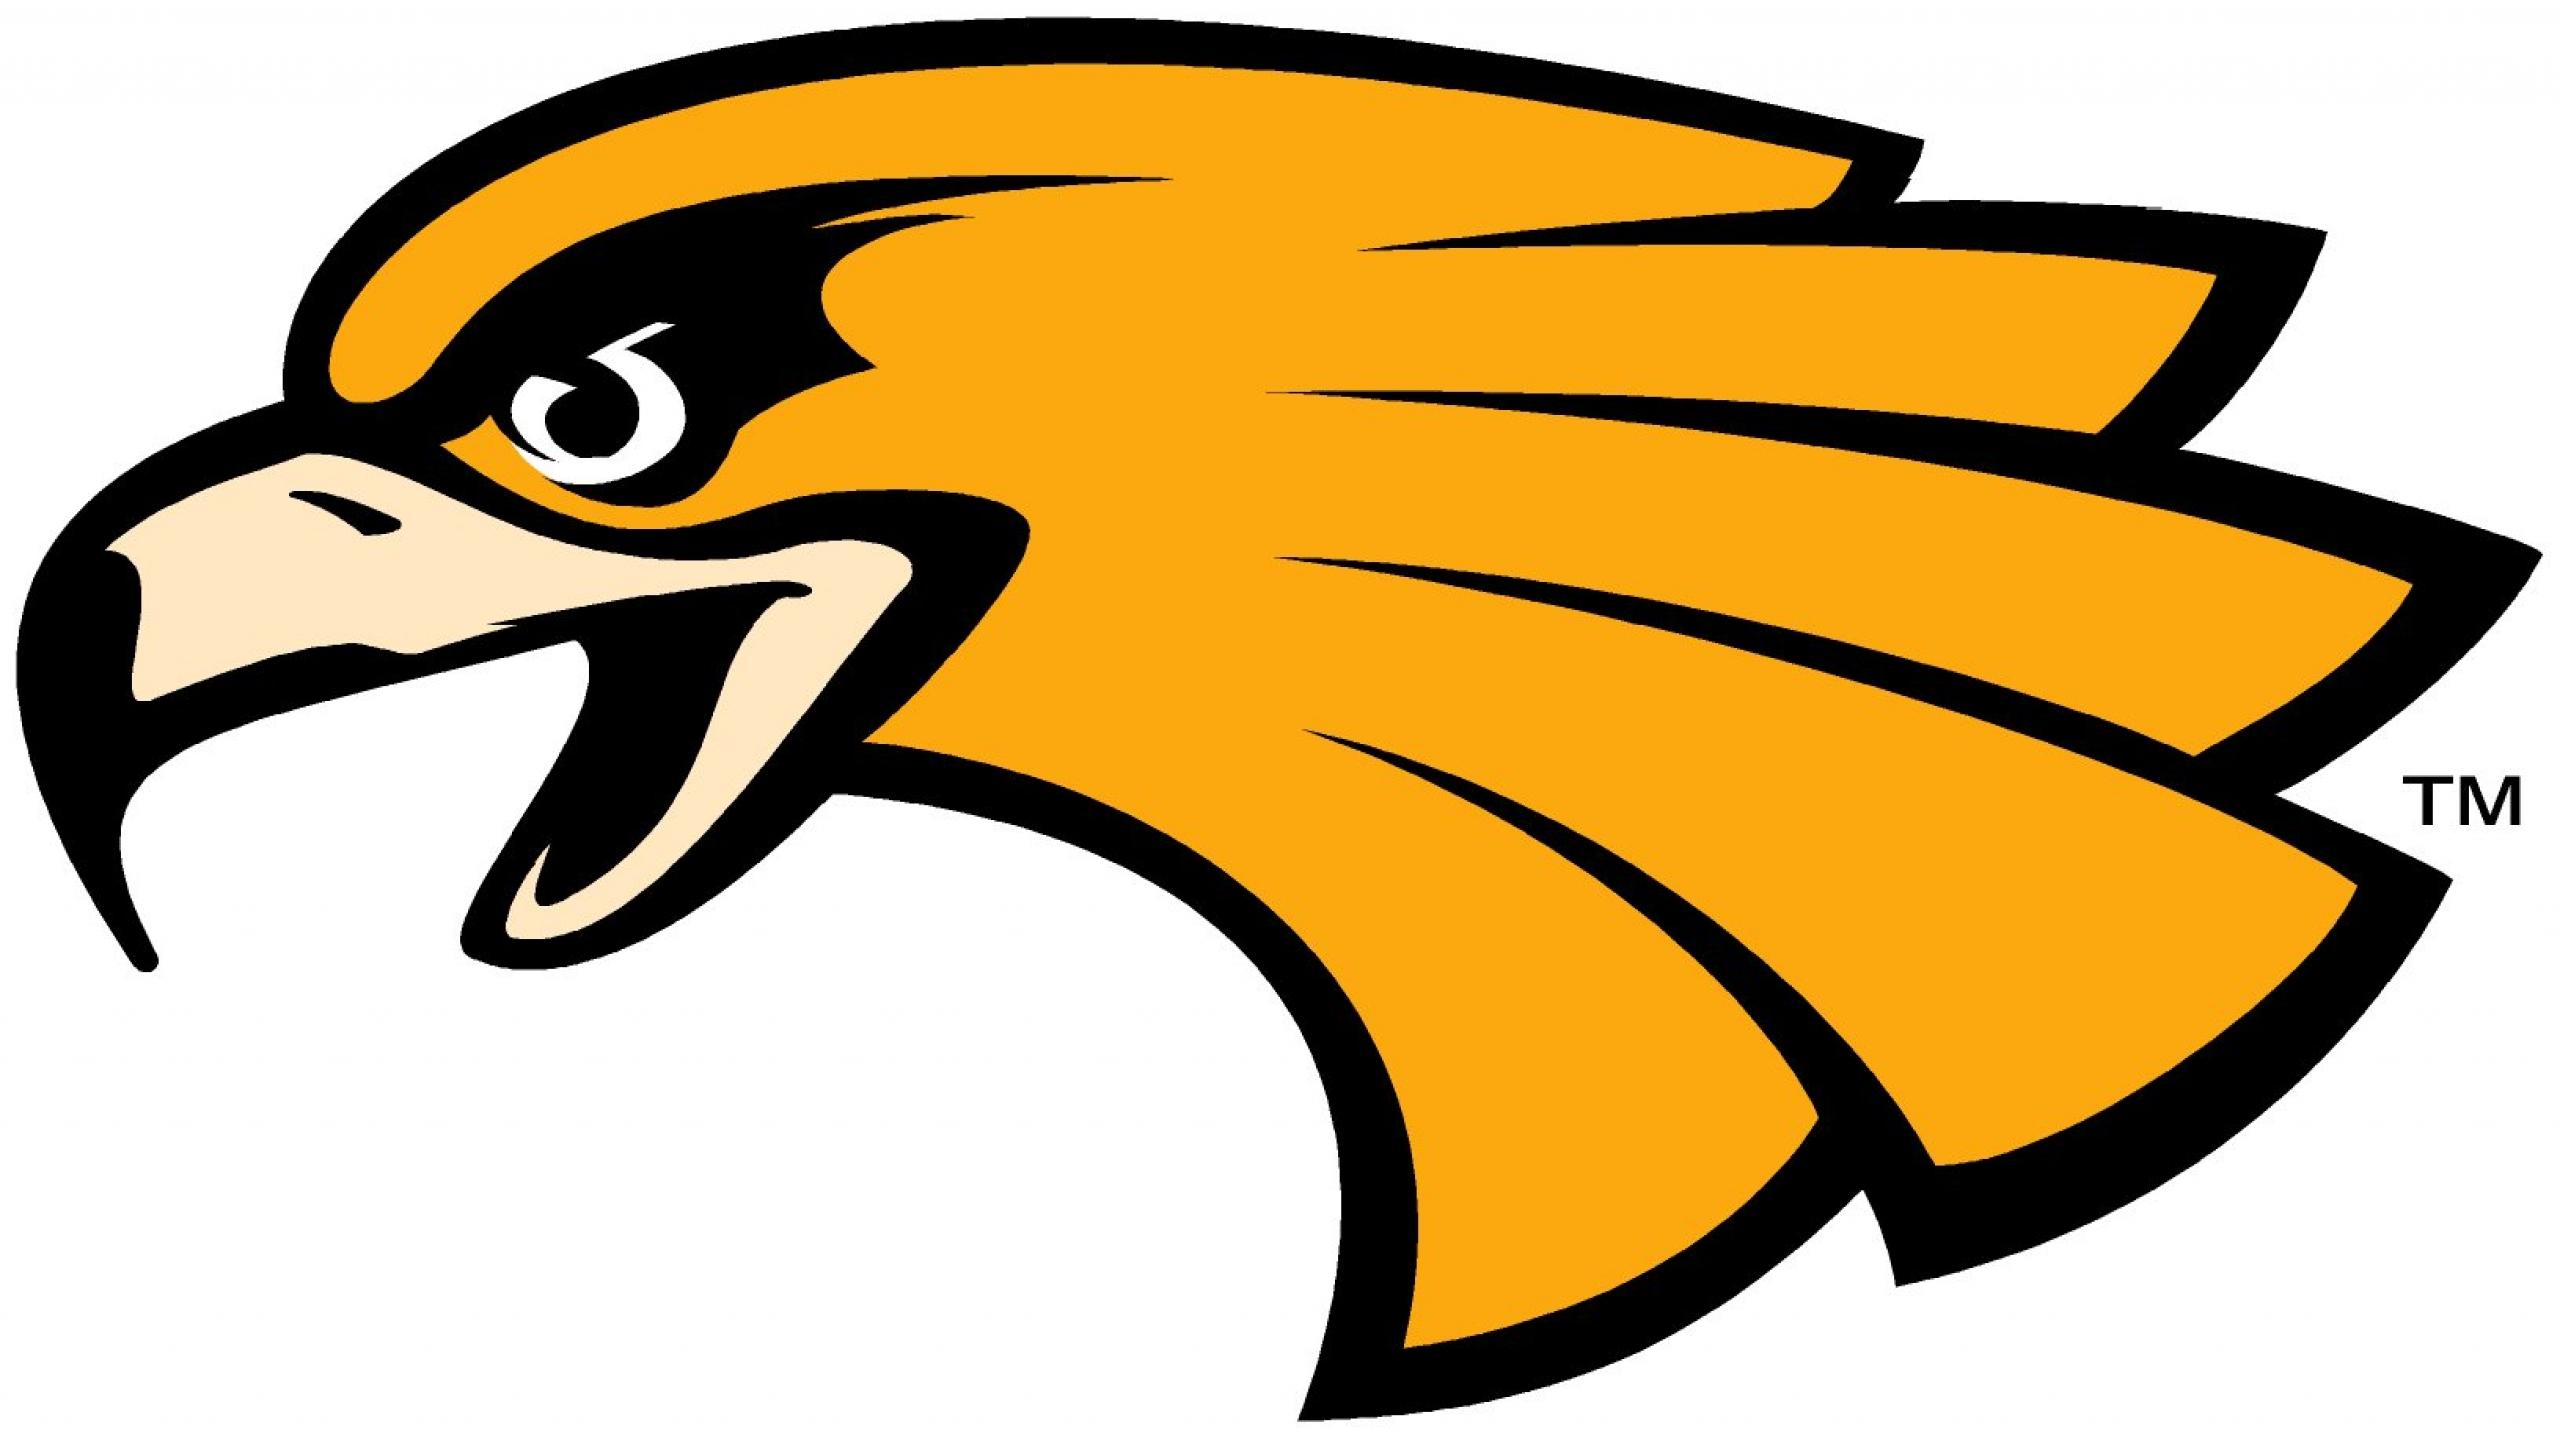 2560x1440 Wonderful Golden Eagle Cartoon A Flying Bald C